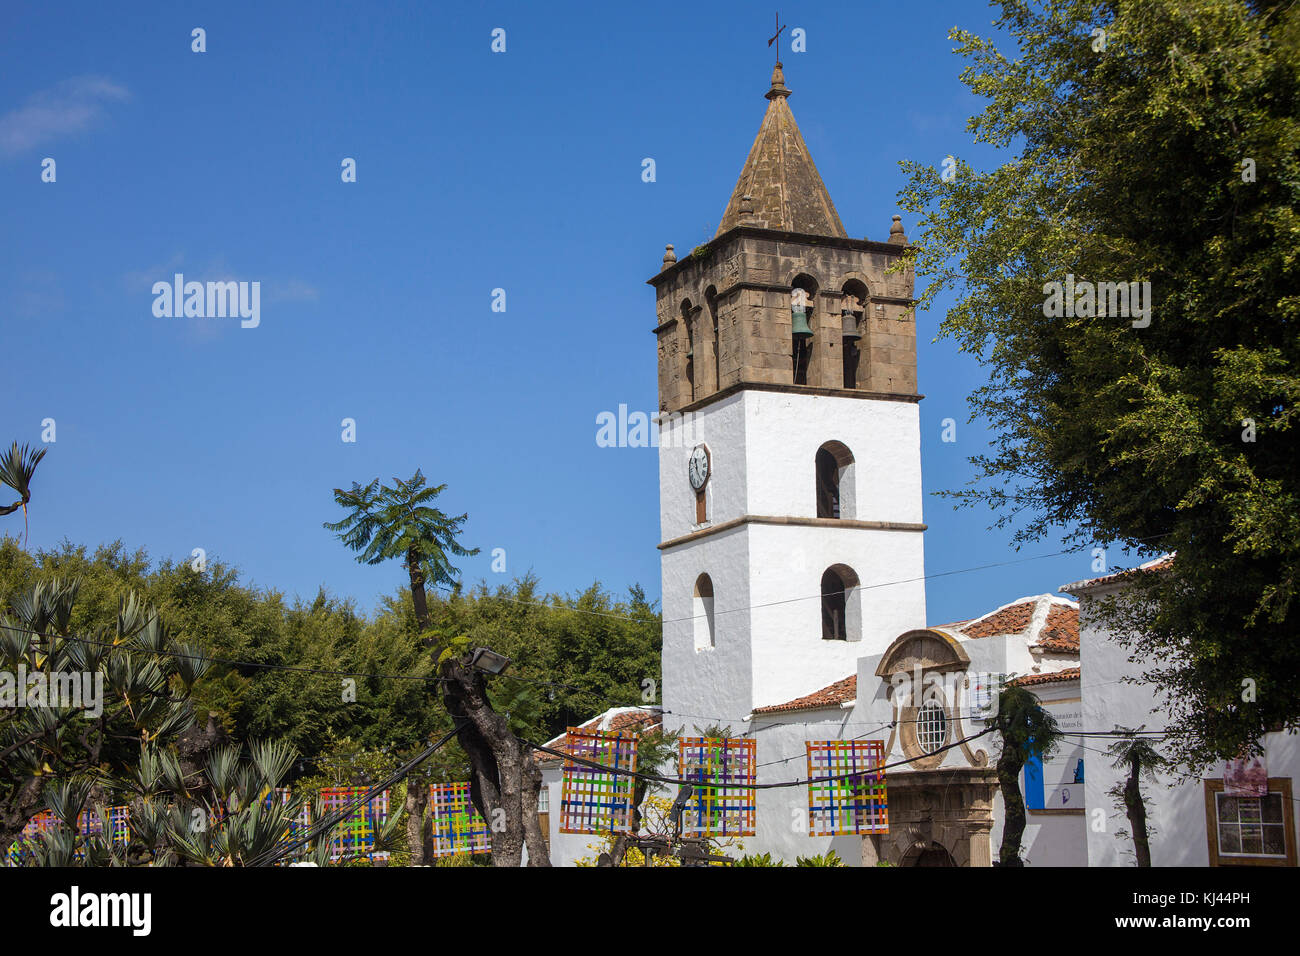 Iglesia de San Marcos, church at Icod de los Vinos, Tenerife island, Canary islands, Spain - Stock Image